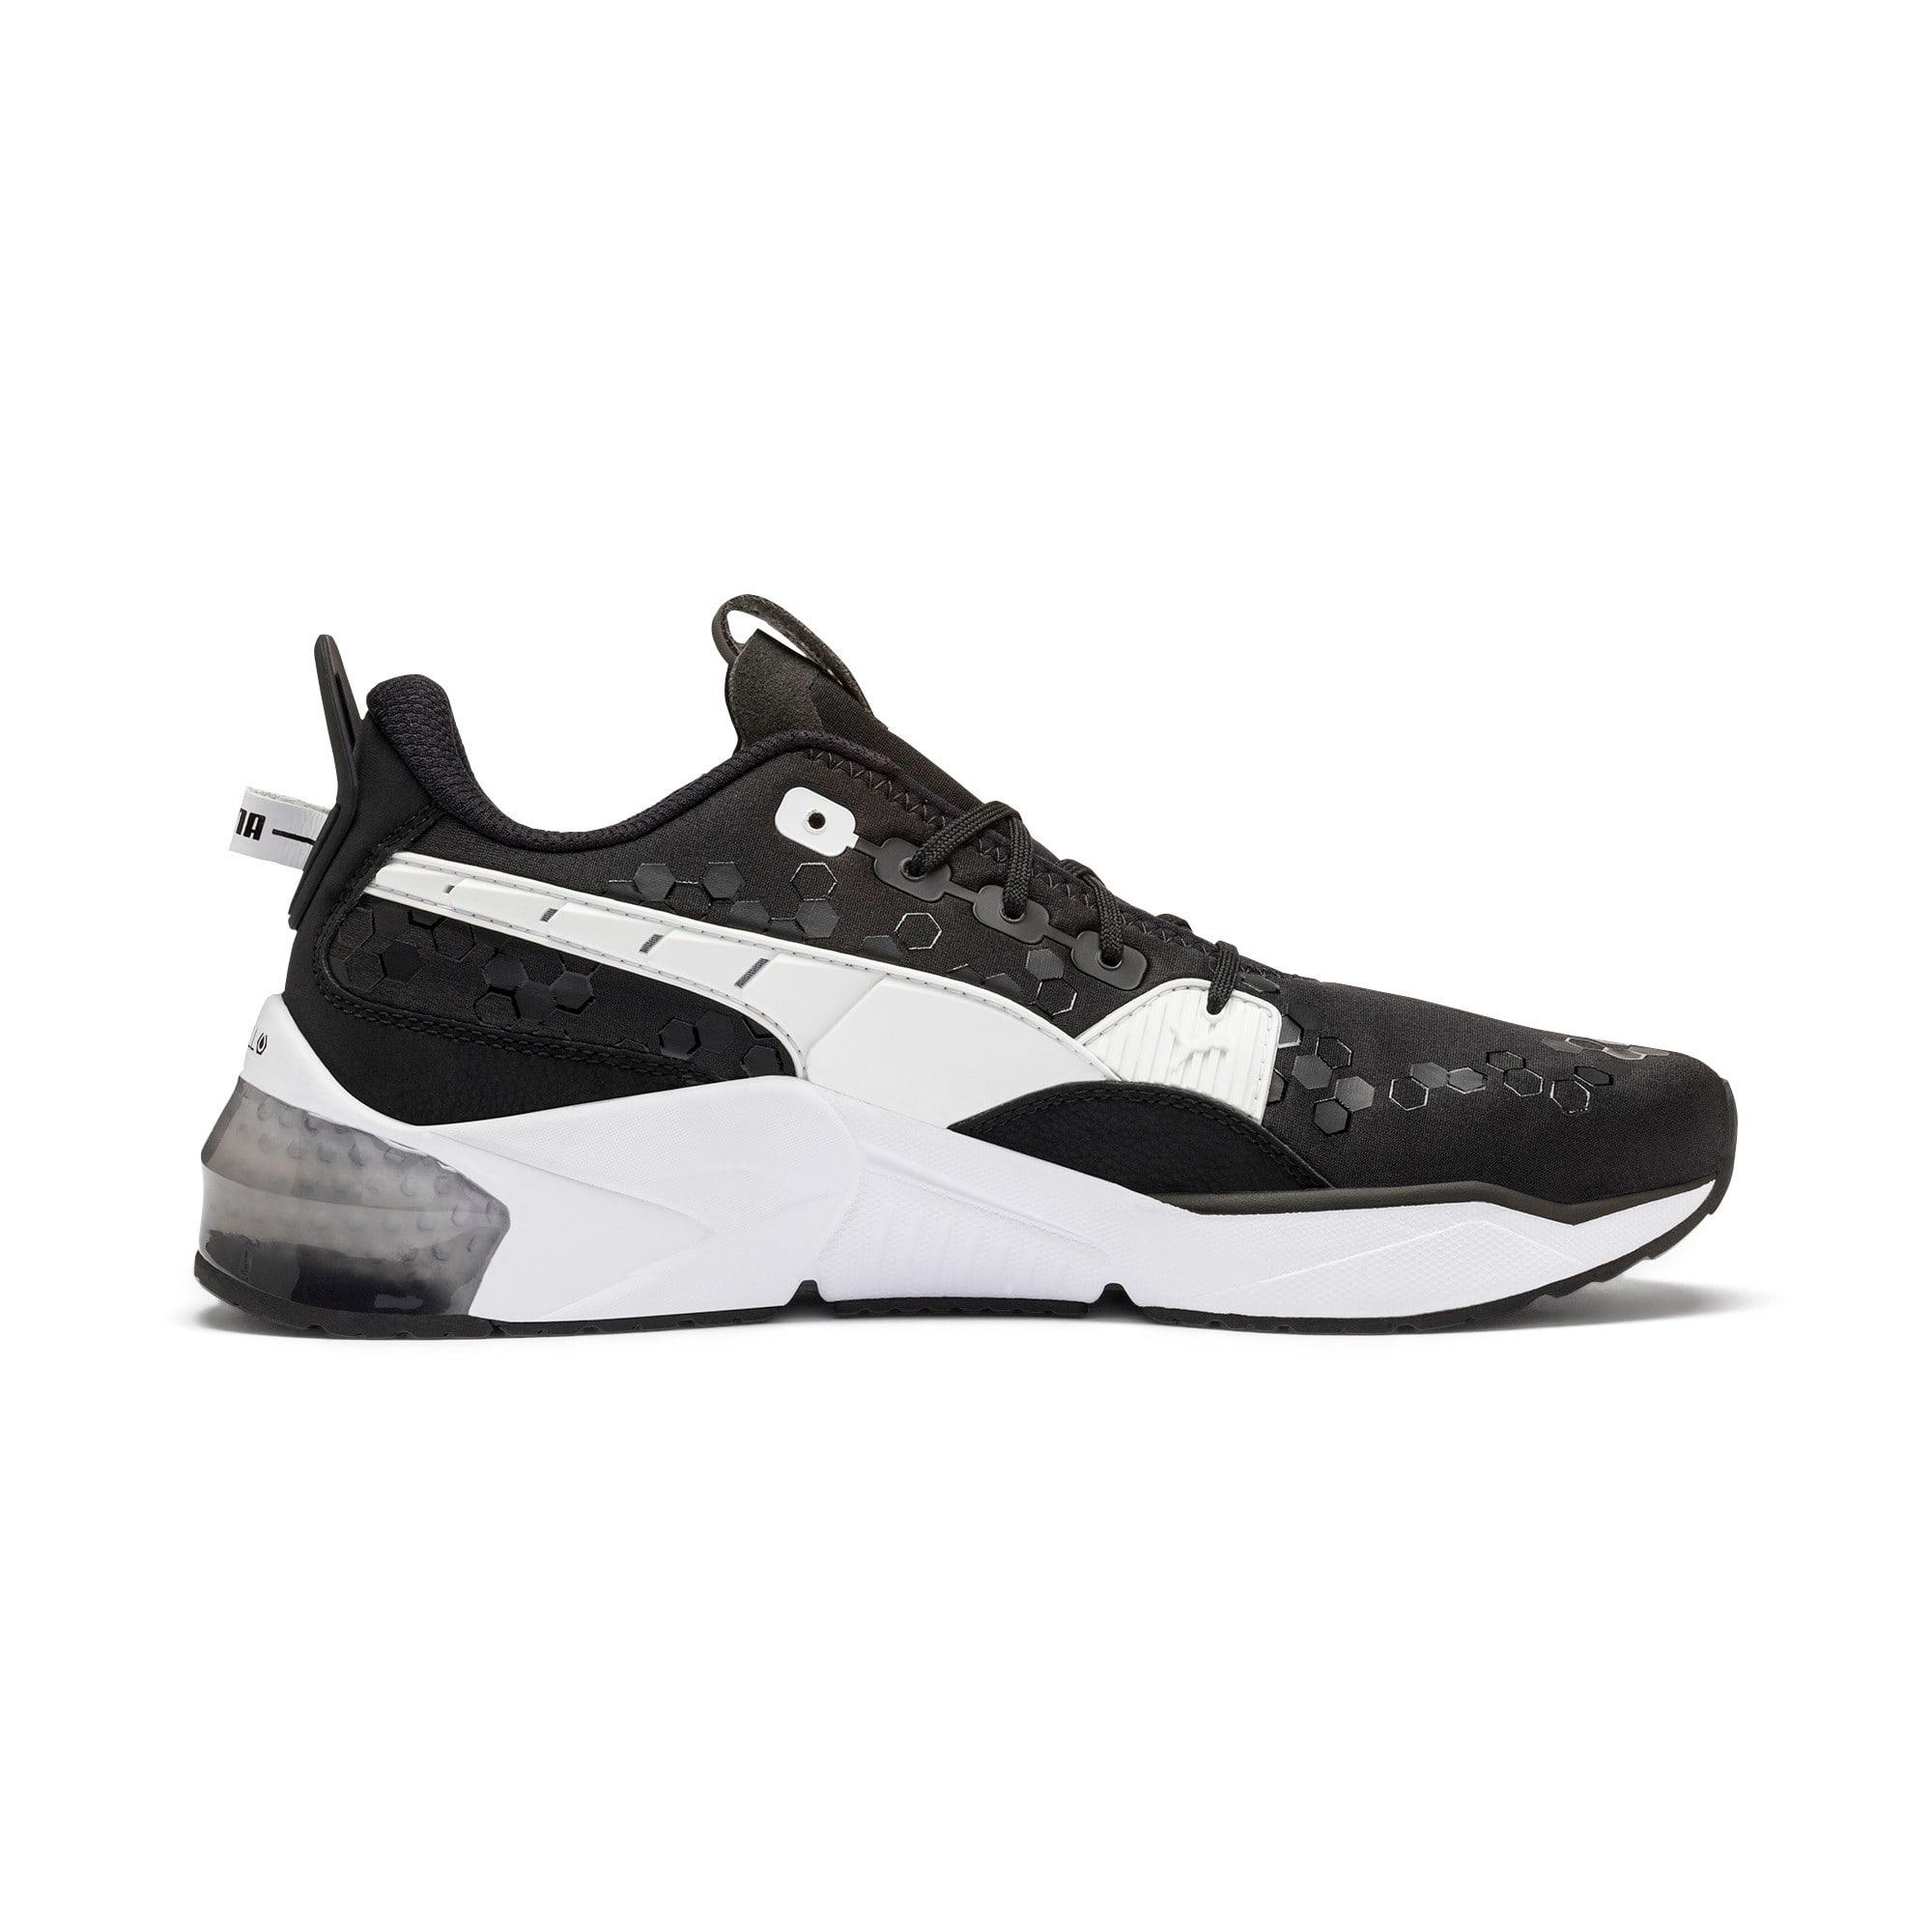 Thumbnail 6 of LQDCELL Optic Training Shoes, Puma Black-Puma White, medium